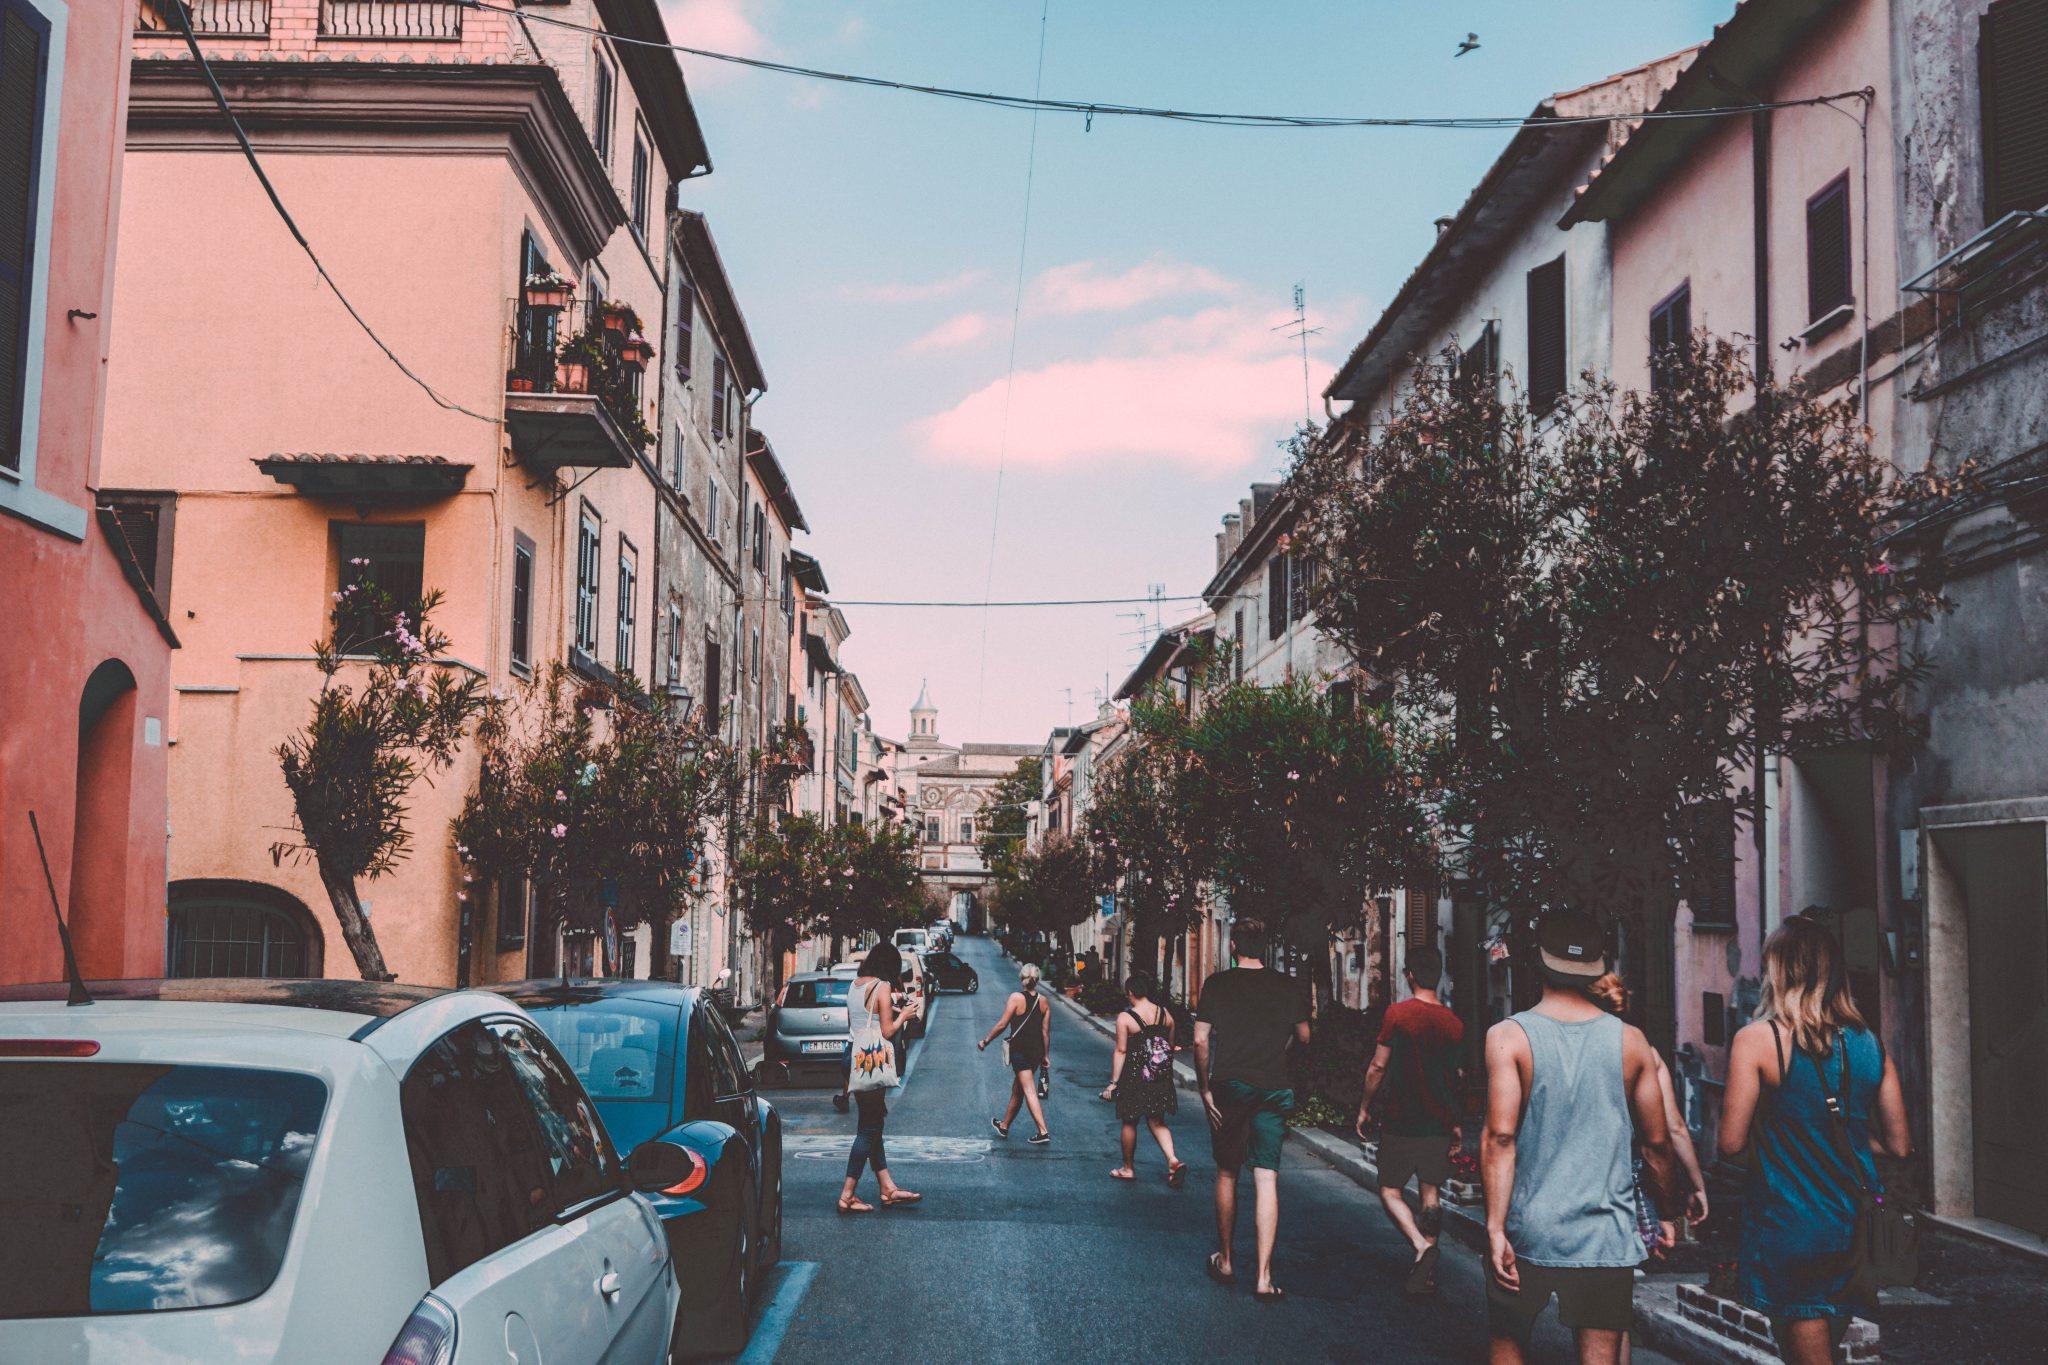 Zagarolo Travel Guide: Quiet Respite from Rome | Italy ...